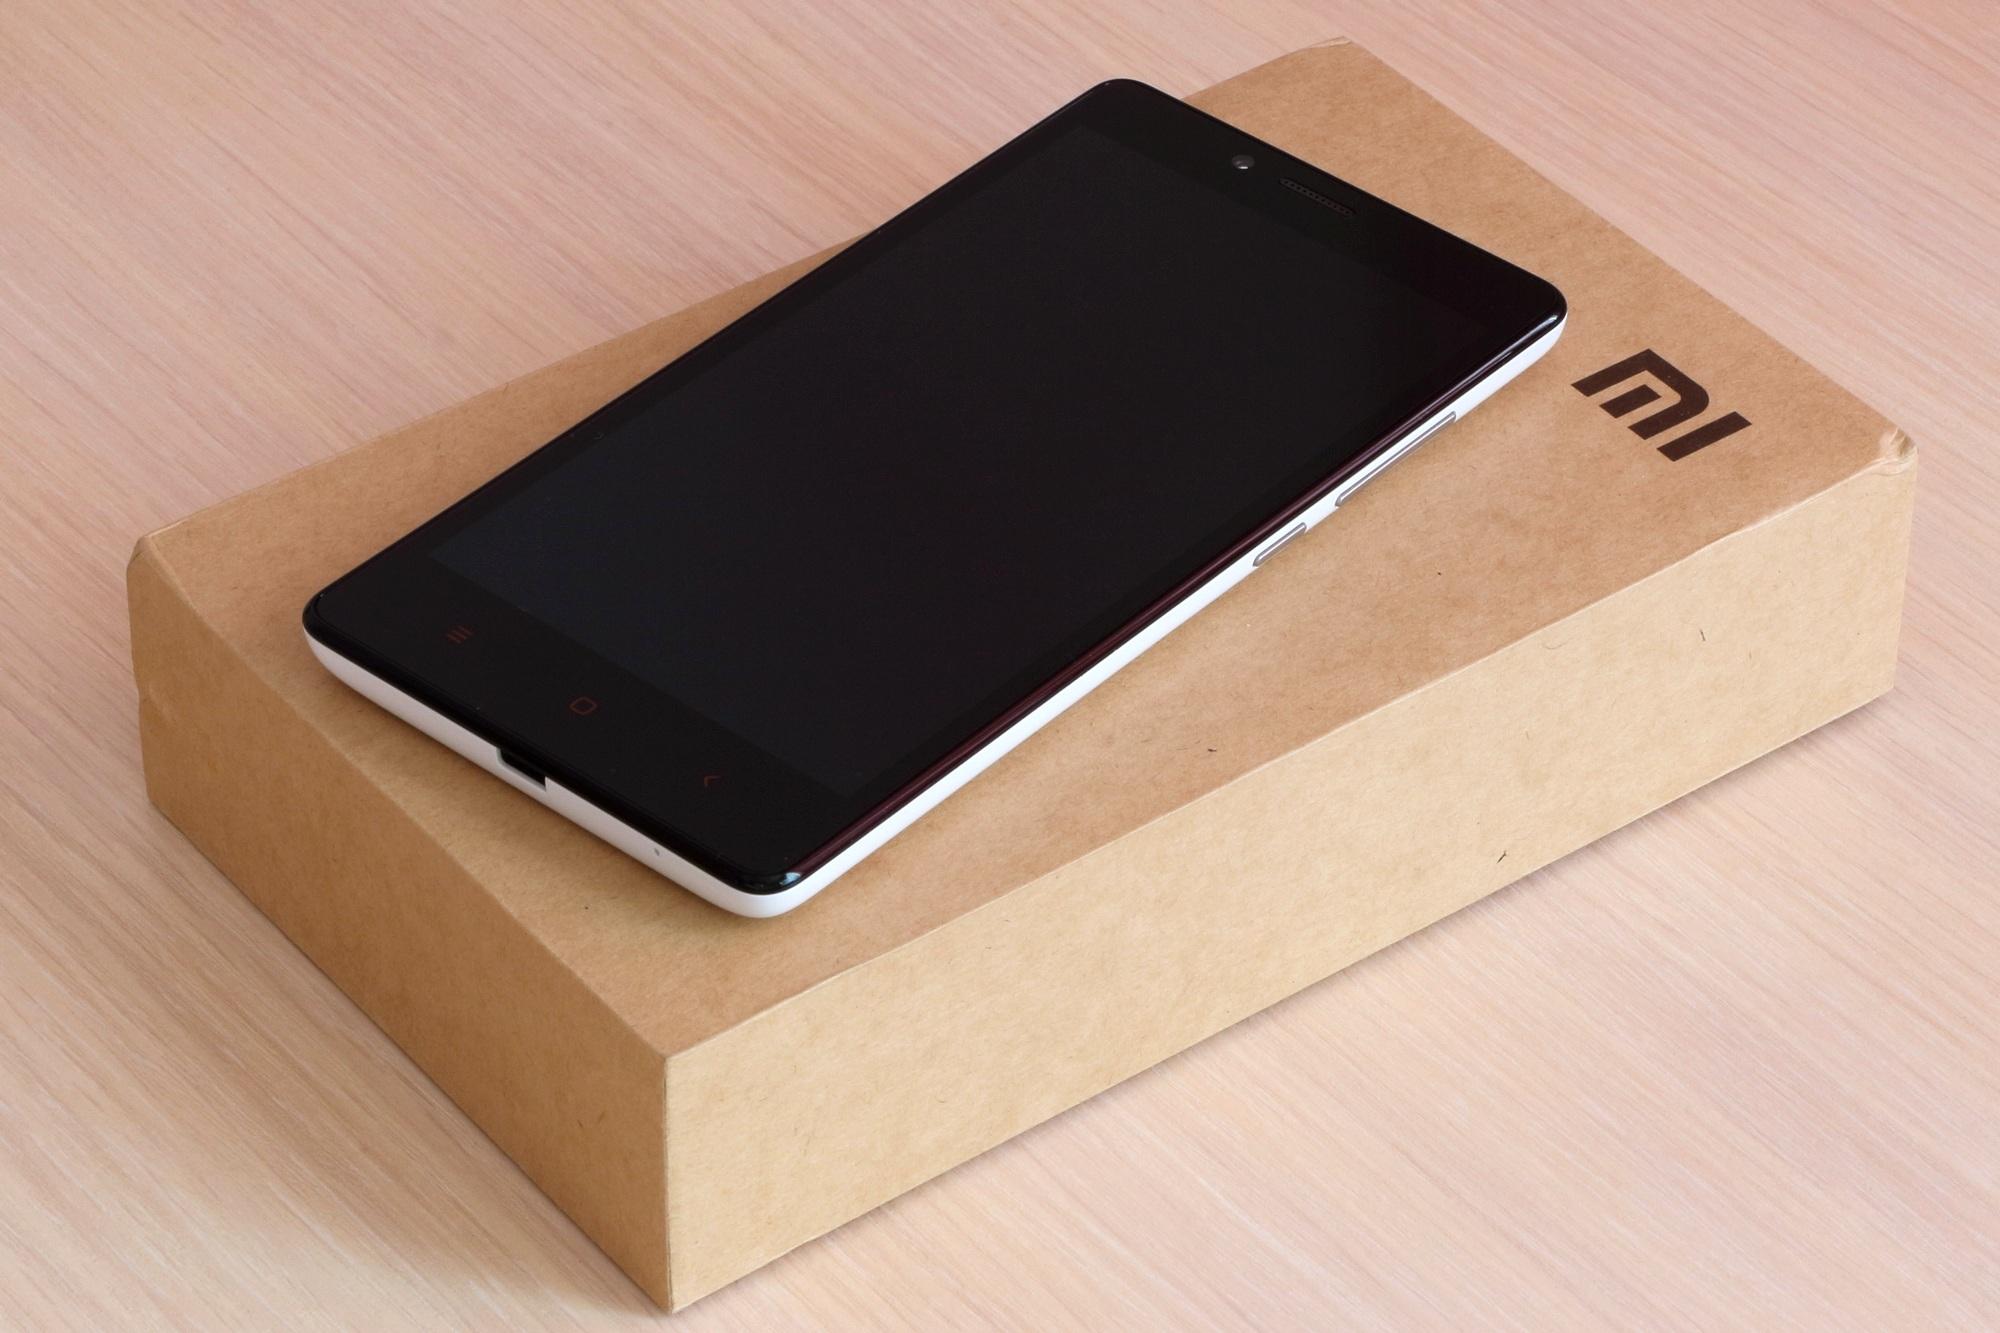 xiaomi phone 4